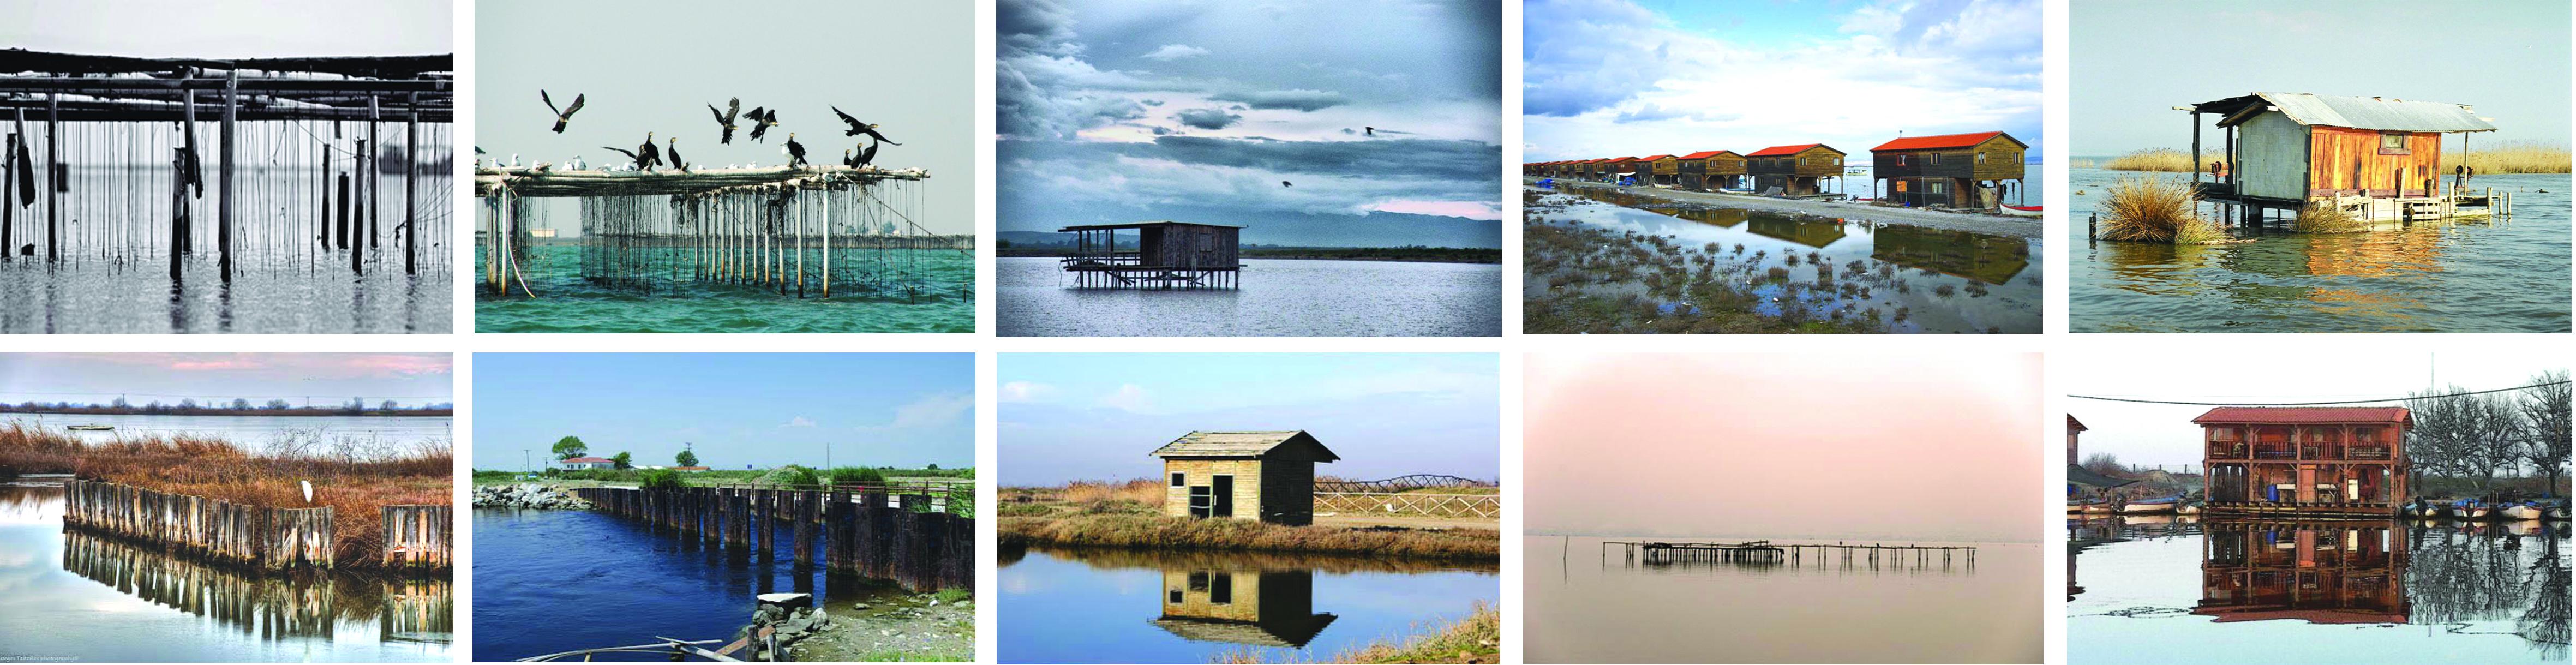 wetland inspiration photos